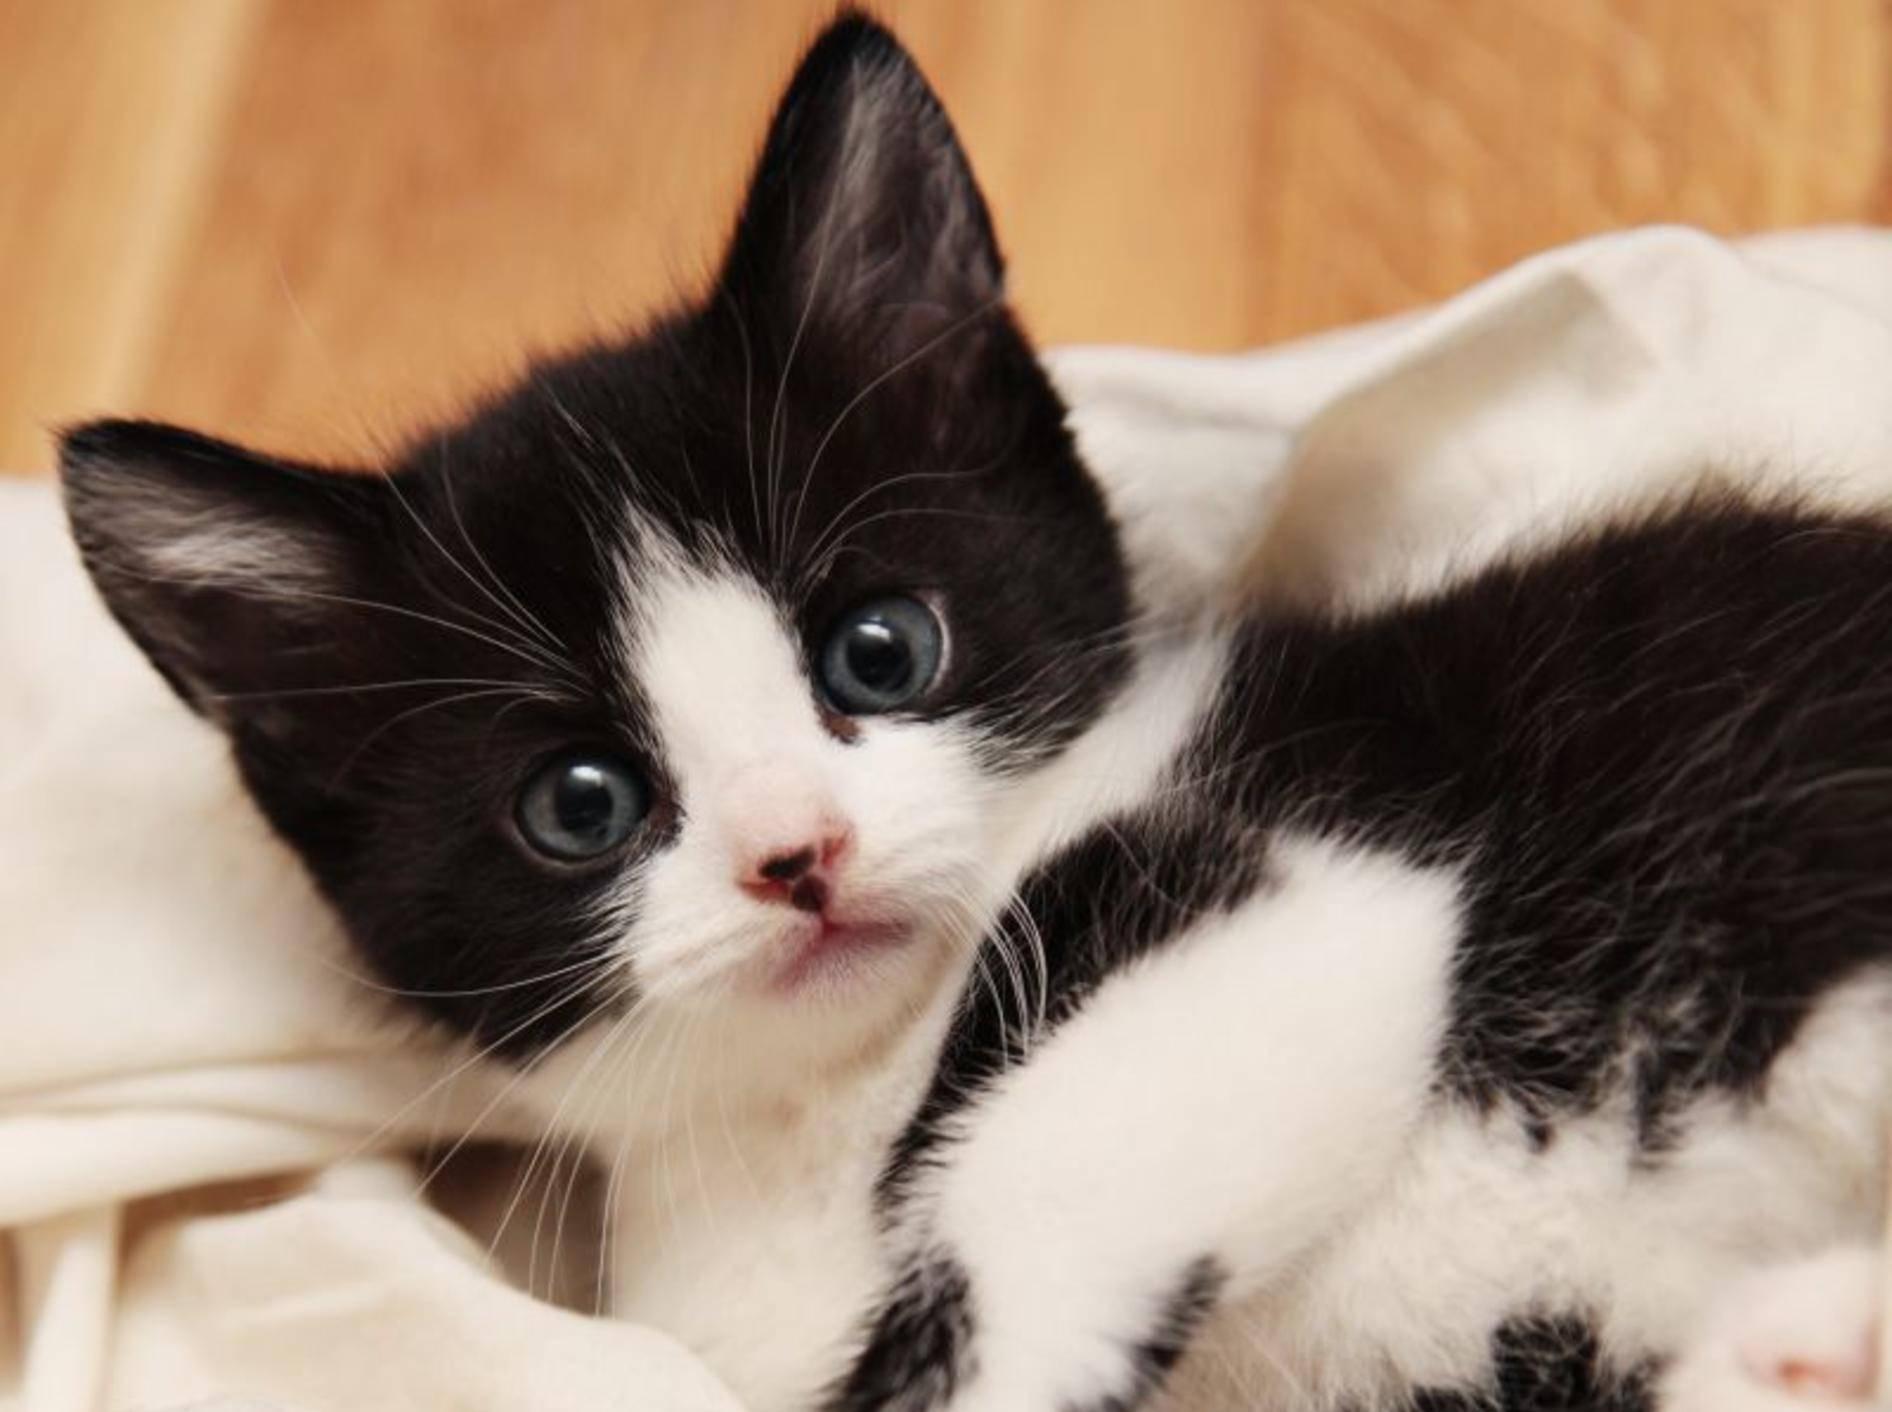 Wo Kann Man Katzenbabys Kaufen